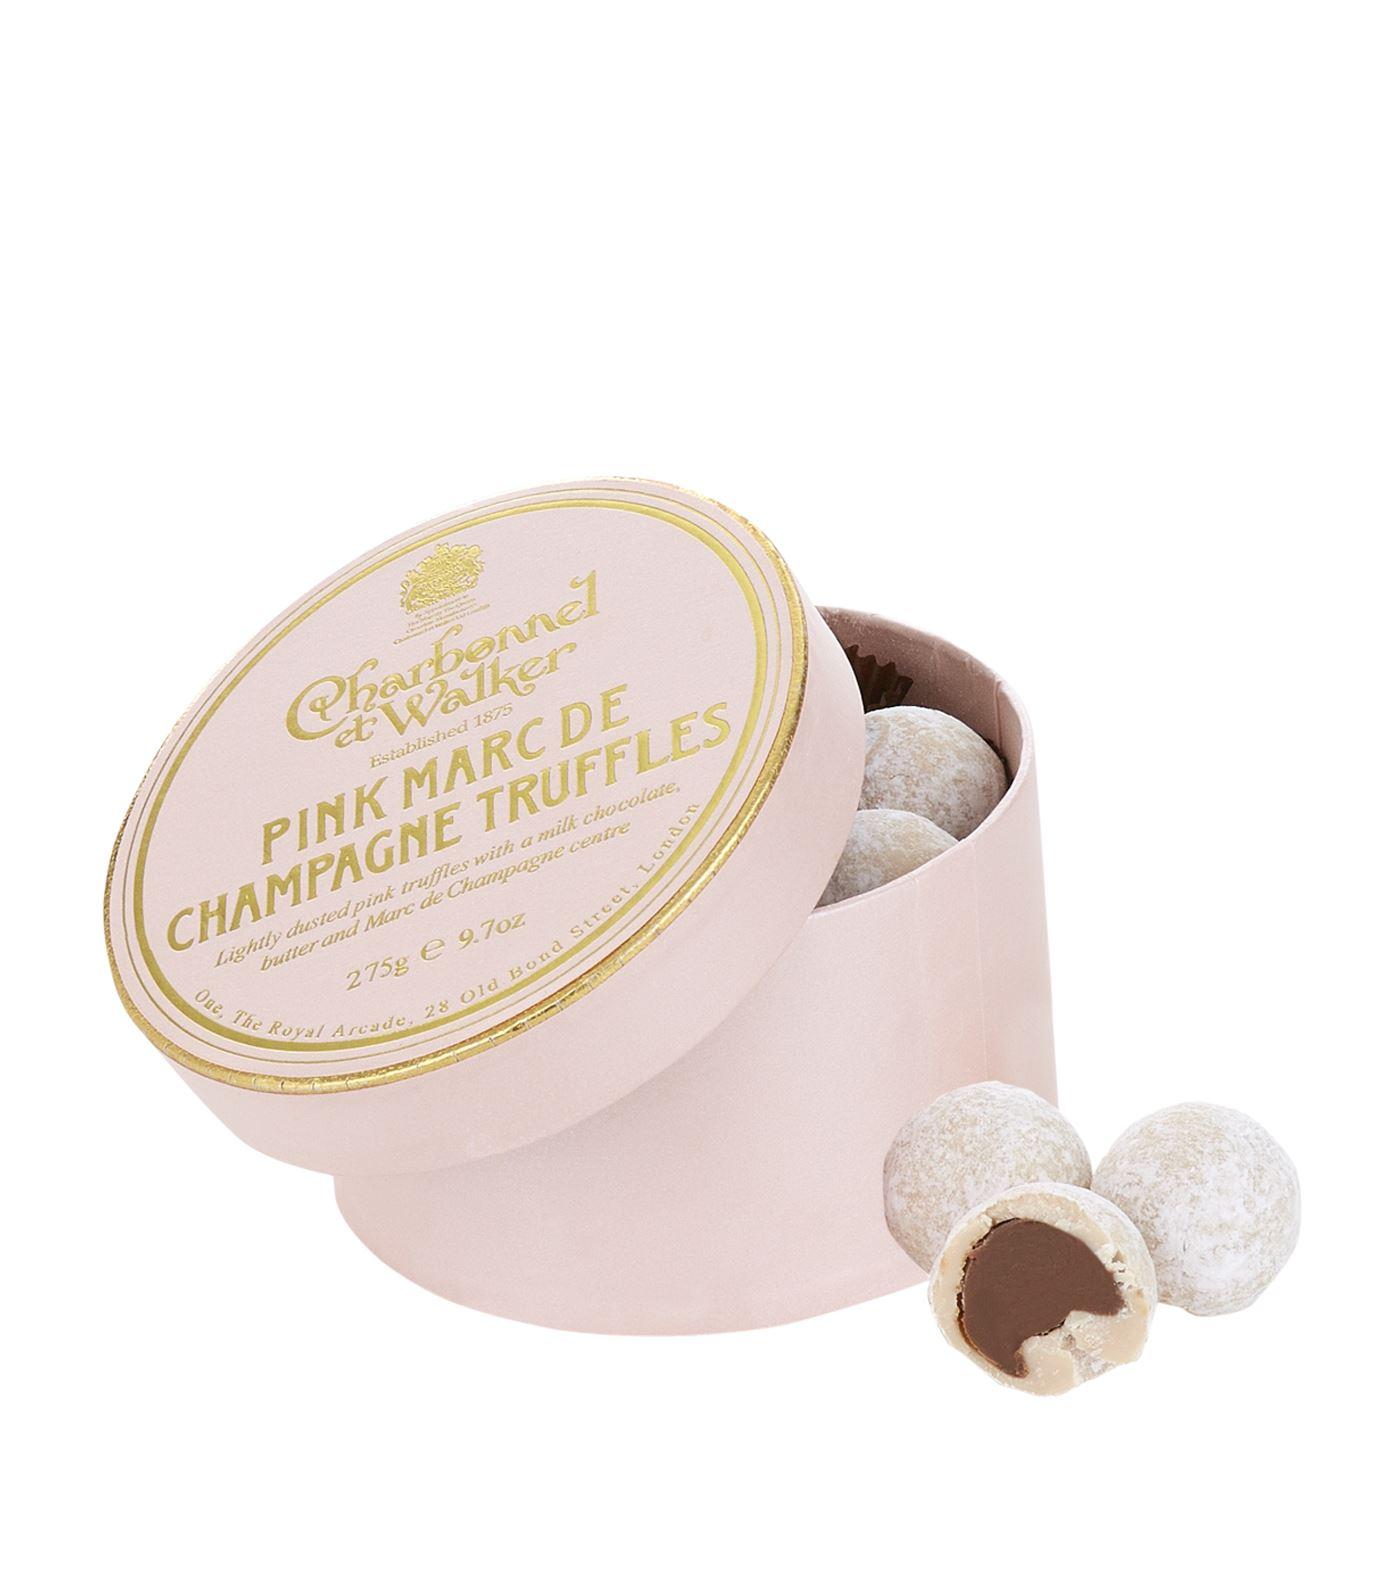 pink-marc-de-champagne-truffles-275g_000000000001291990.jpg